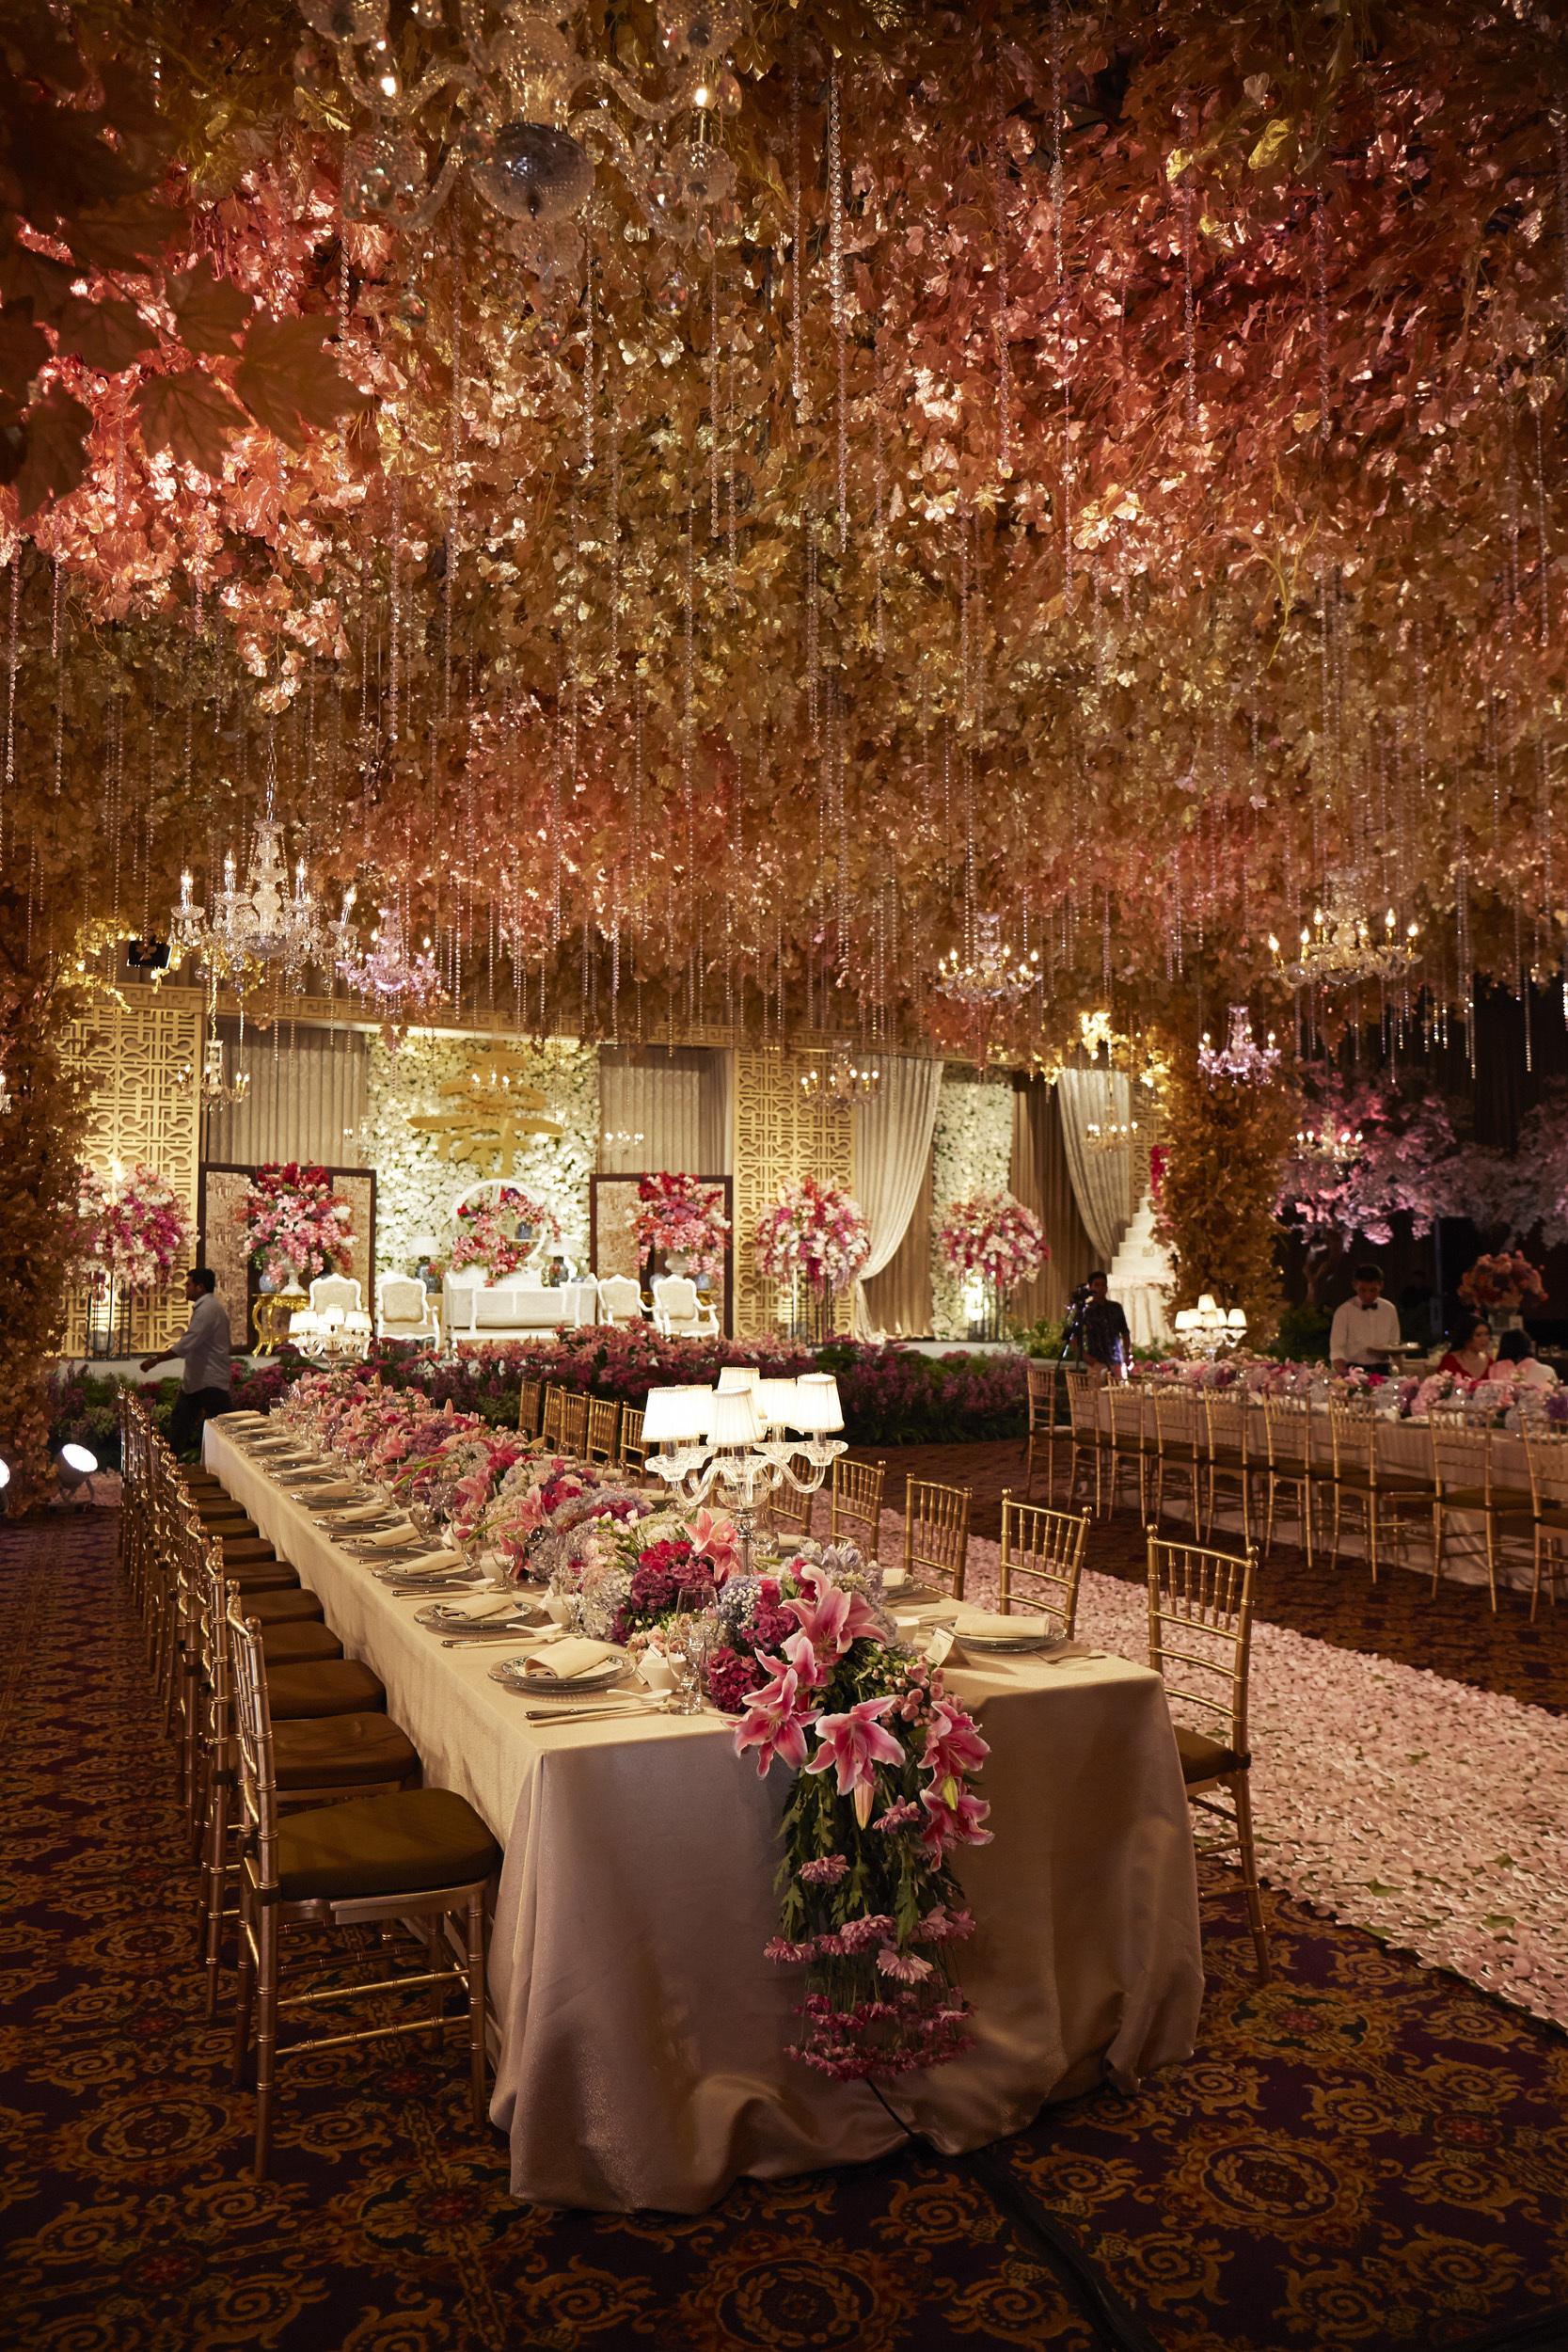 Steves decor wedding decoration lighting in surabaya steves decor wedding decoration lighting in surabaya bridestory junglespirit Image collections